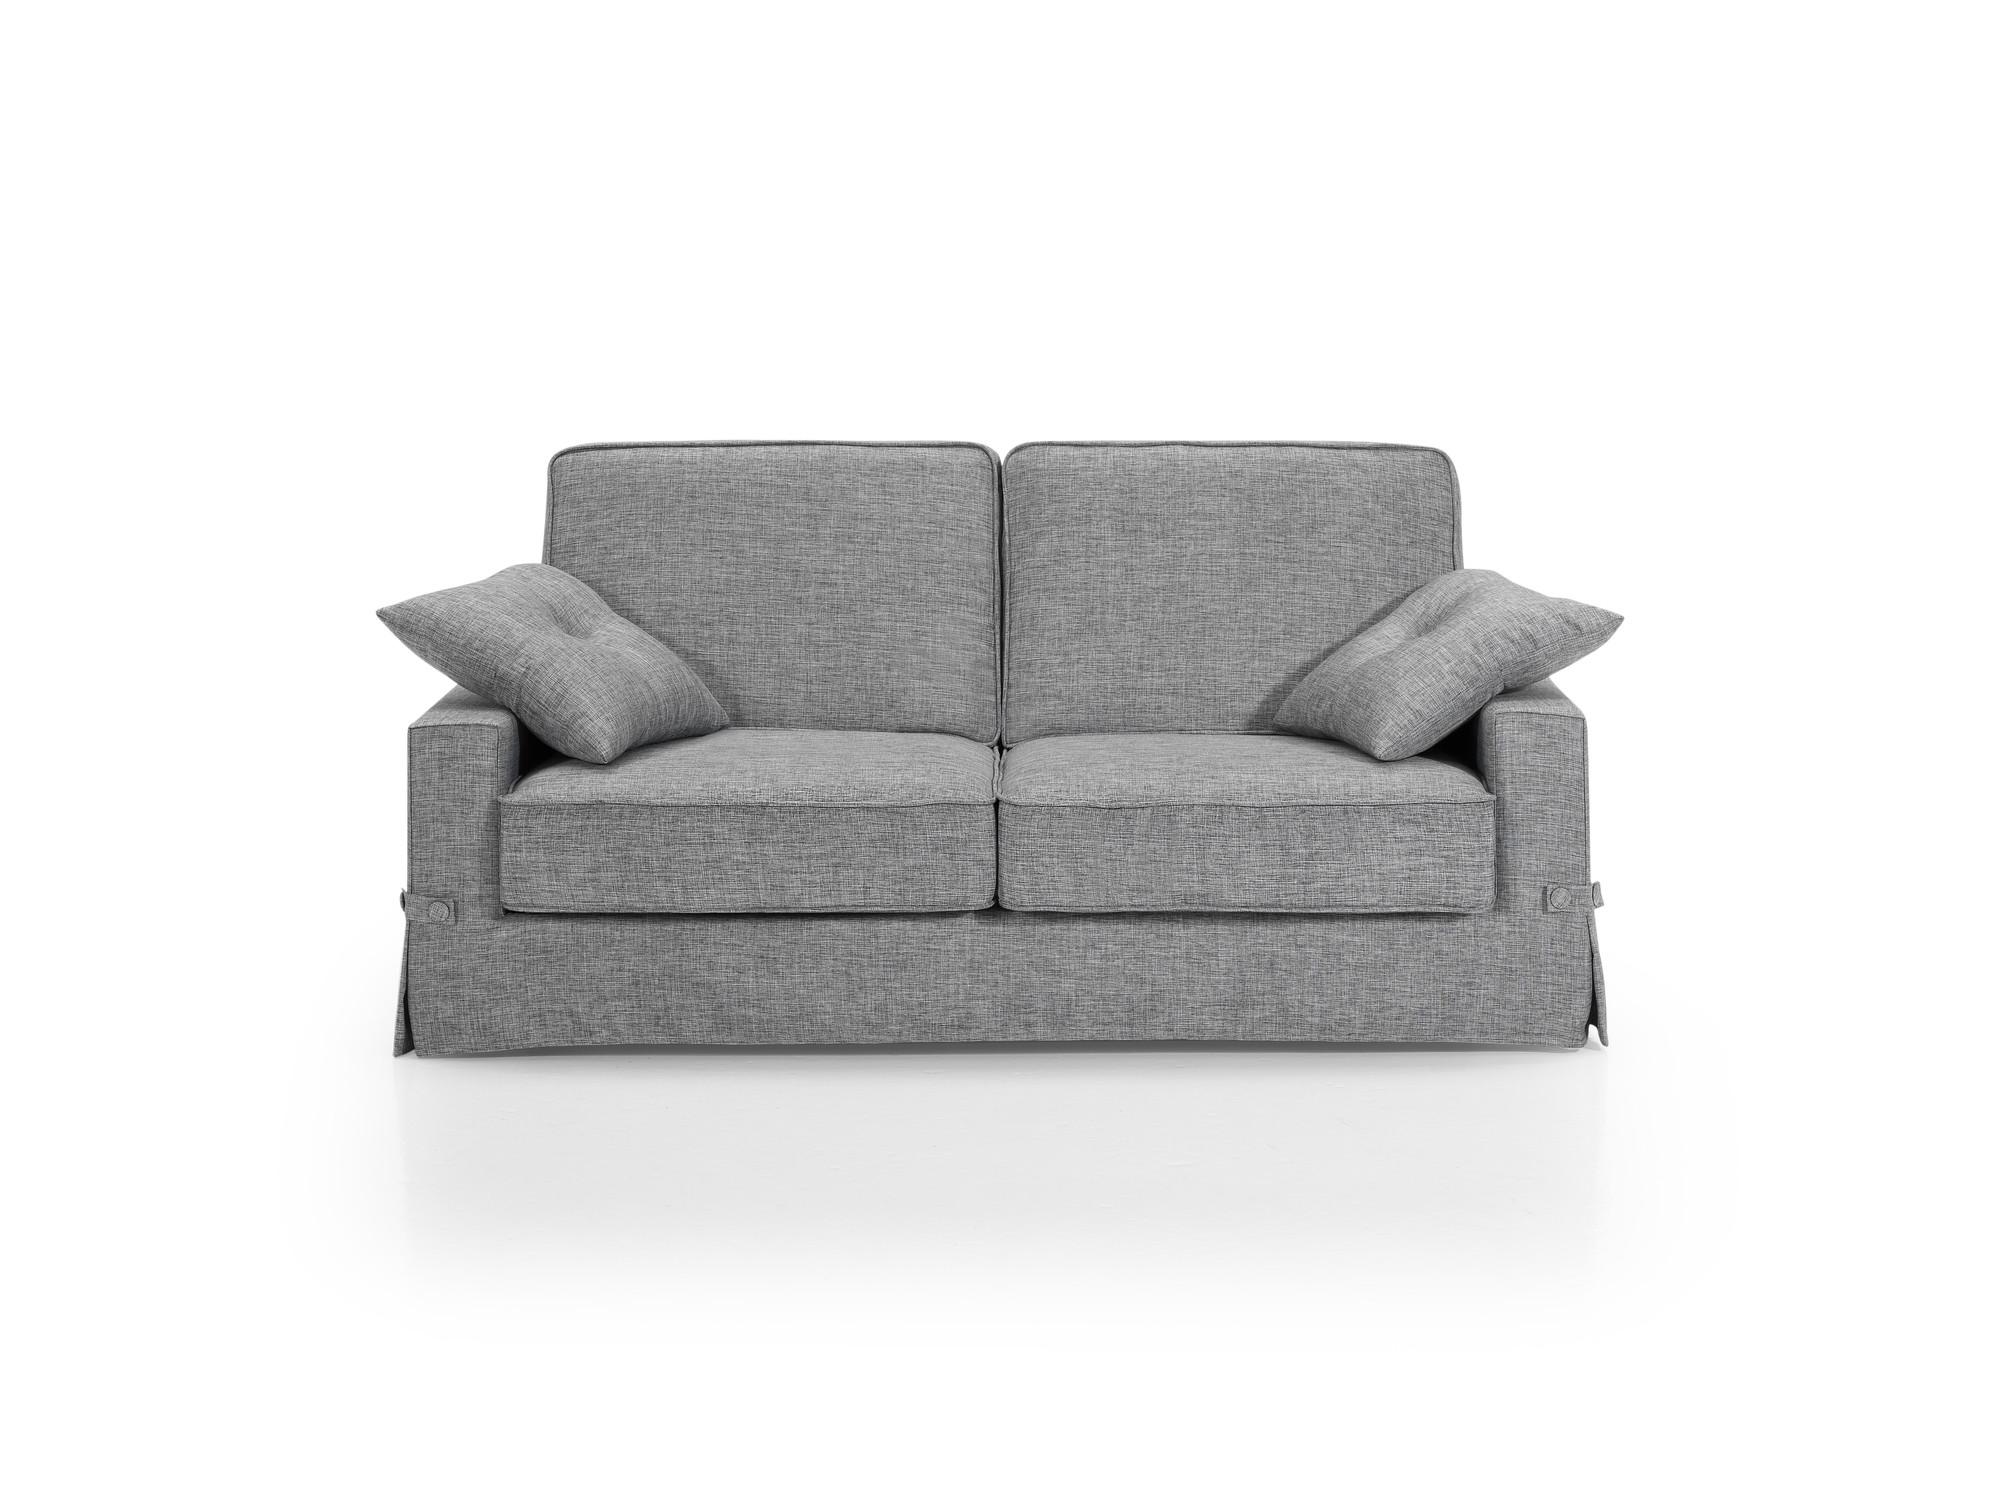 Comprar sofas cama baratos online la mesa de centro for Sofa cama puff barato